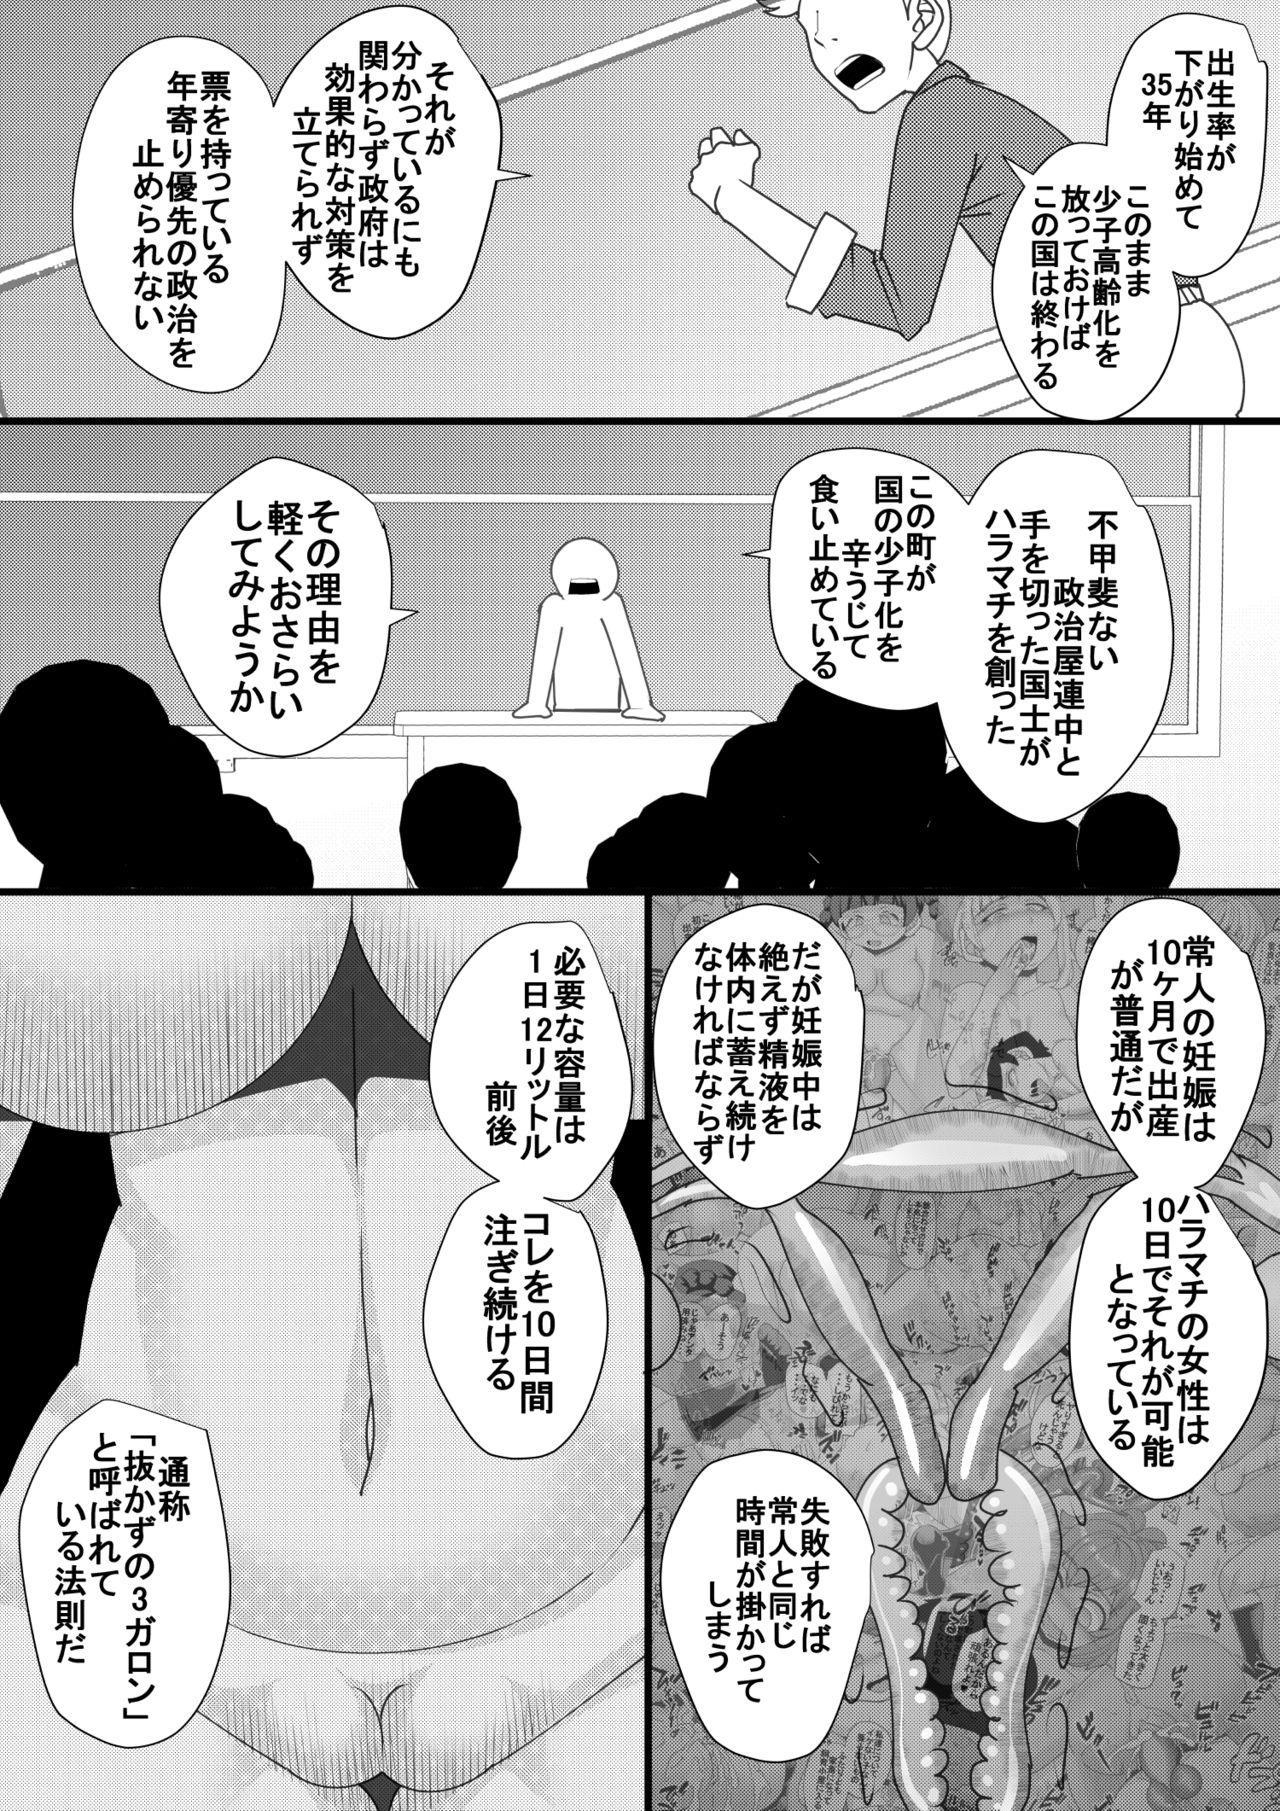 Haramachi 3 4